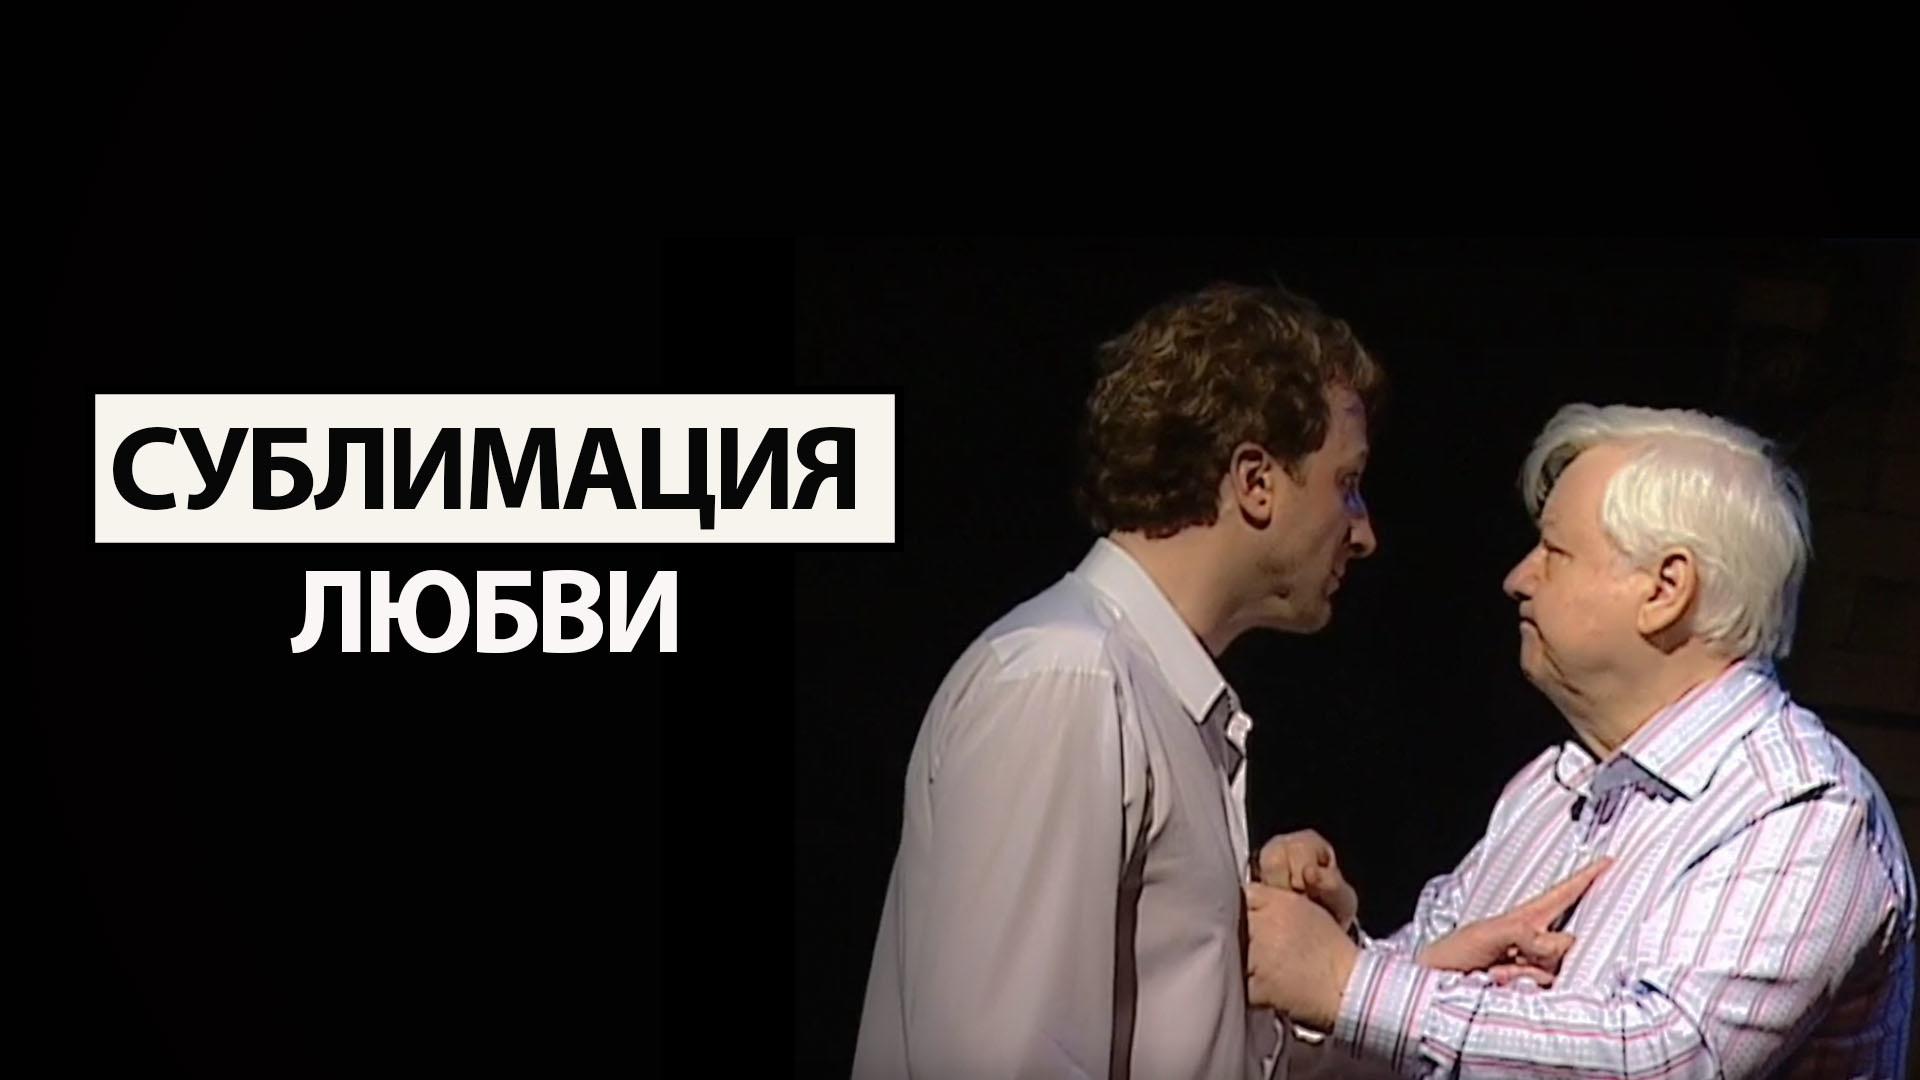 """Сублимация любви"" (Московский театр под руководством О. Табакова)"